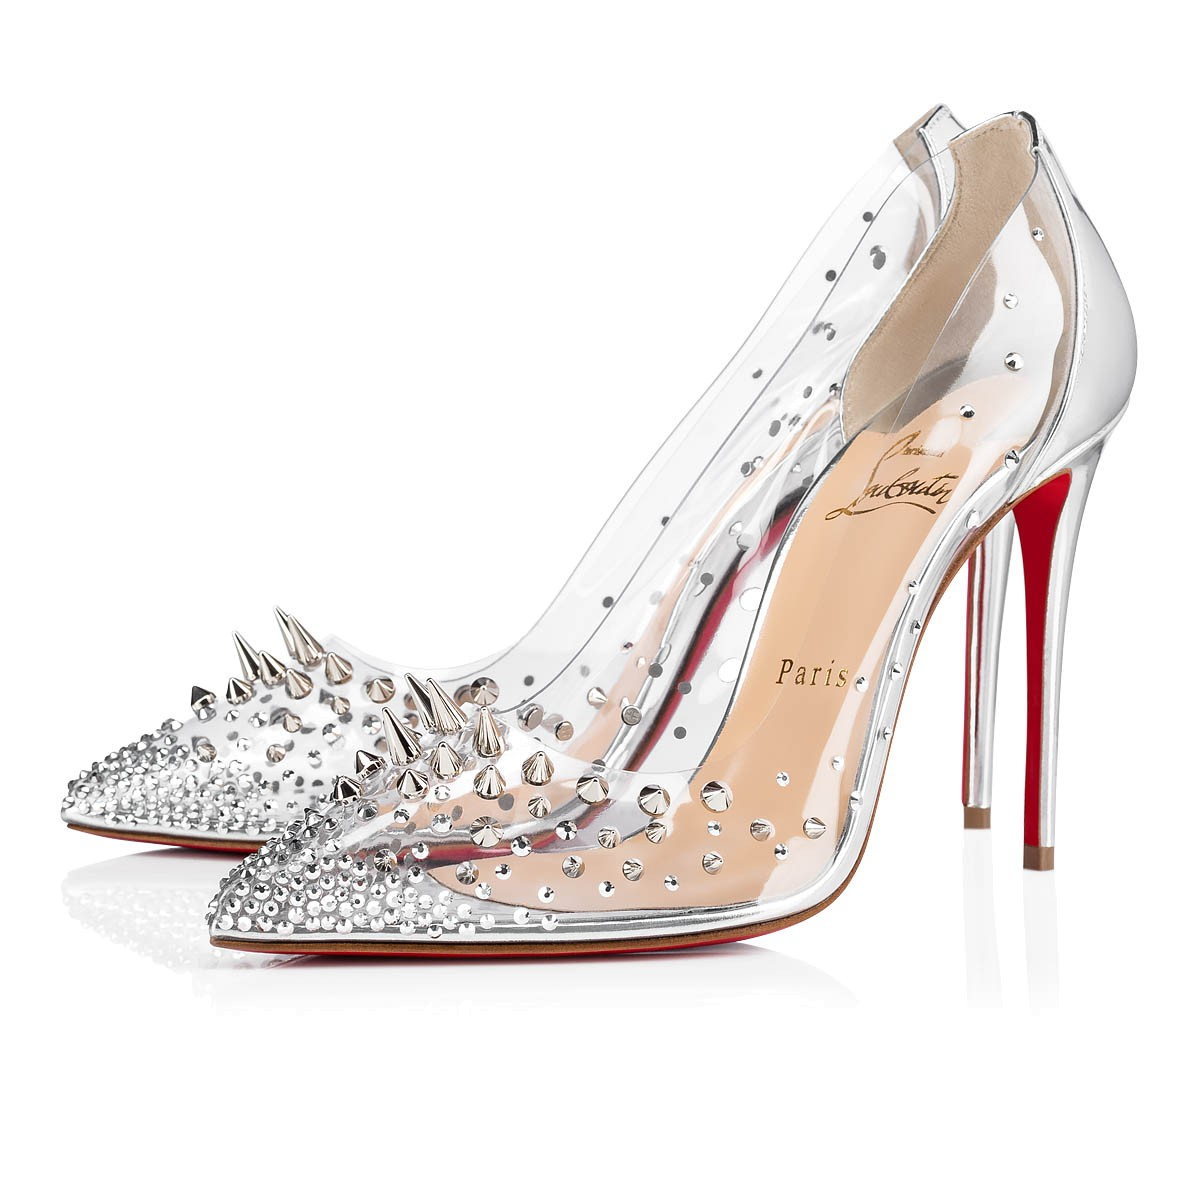 huge discount c52eb 07374 GROTIKA 100 Silver PVC - Women Shoes - Christian Louboutin